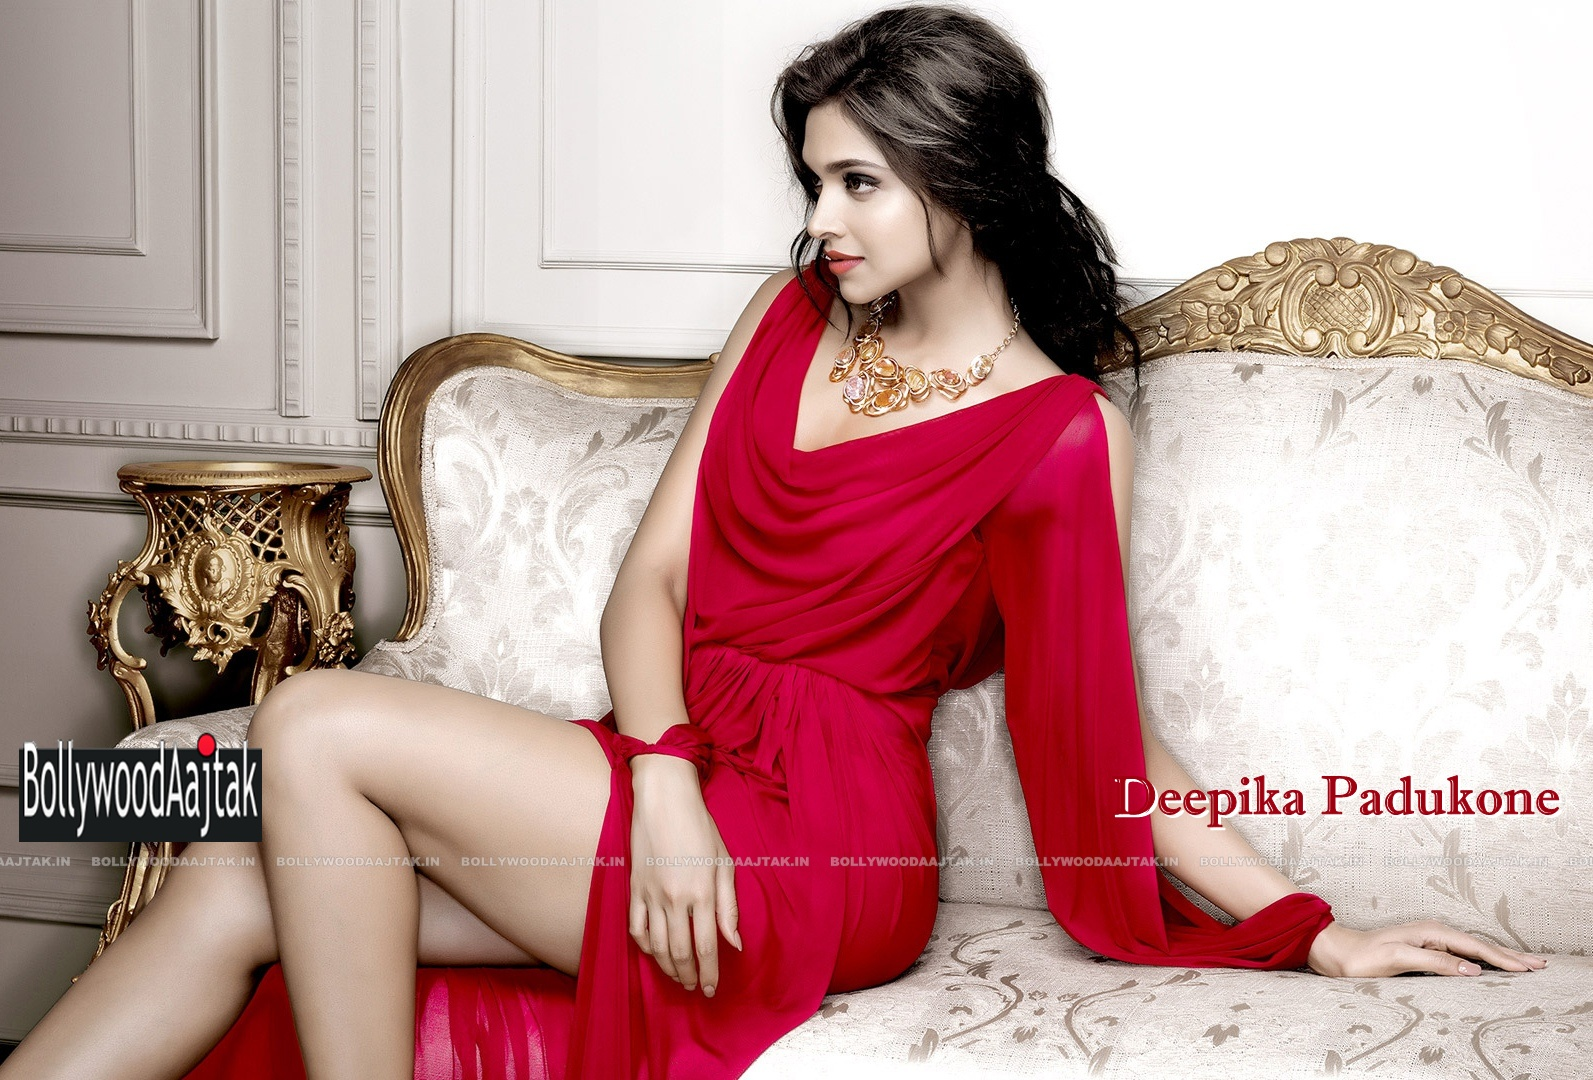 Deepika Padukone Wallpapers Deepika Padukone Latest Hot -6398